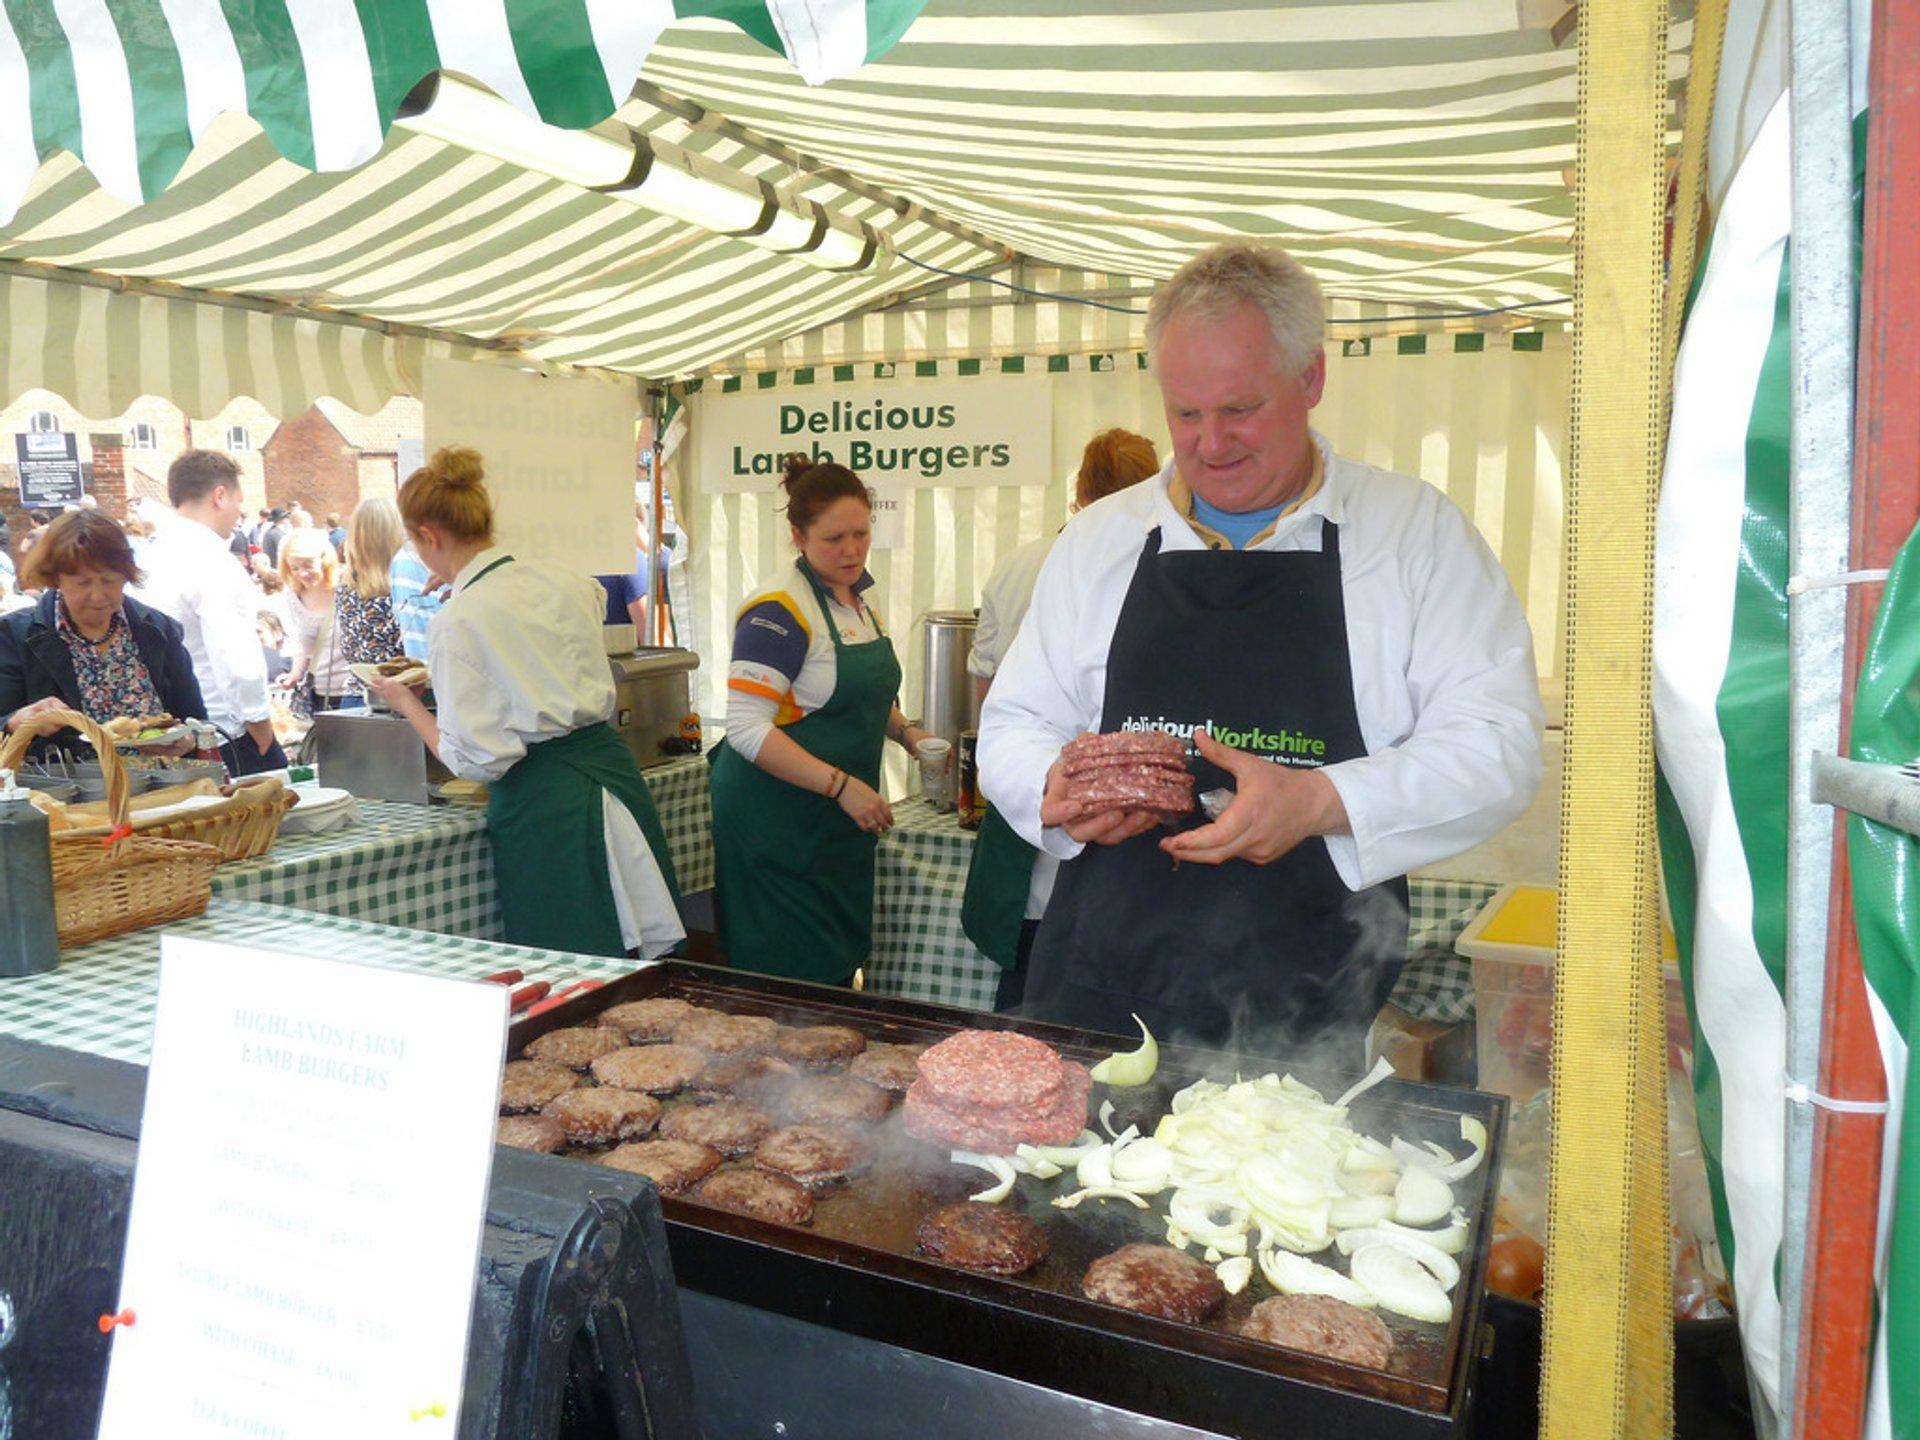 Malton Food Lovers Festival in England 2020 - Best Time